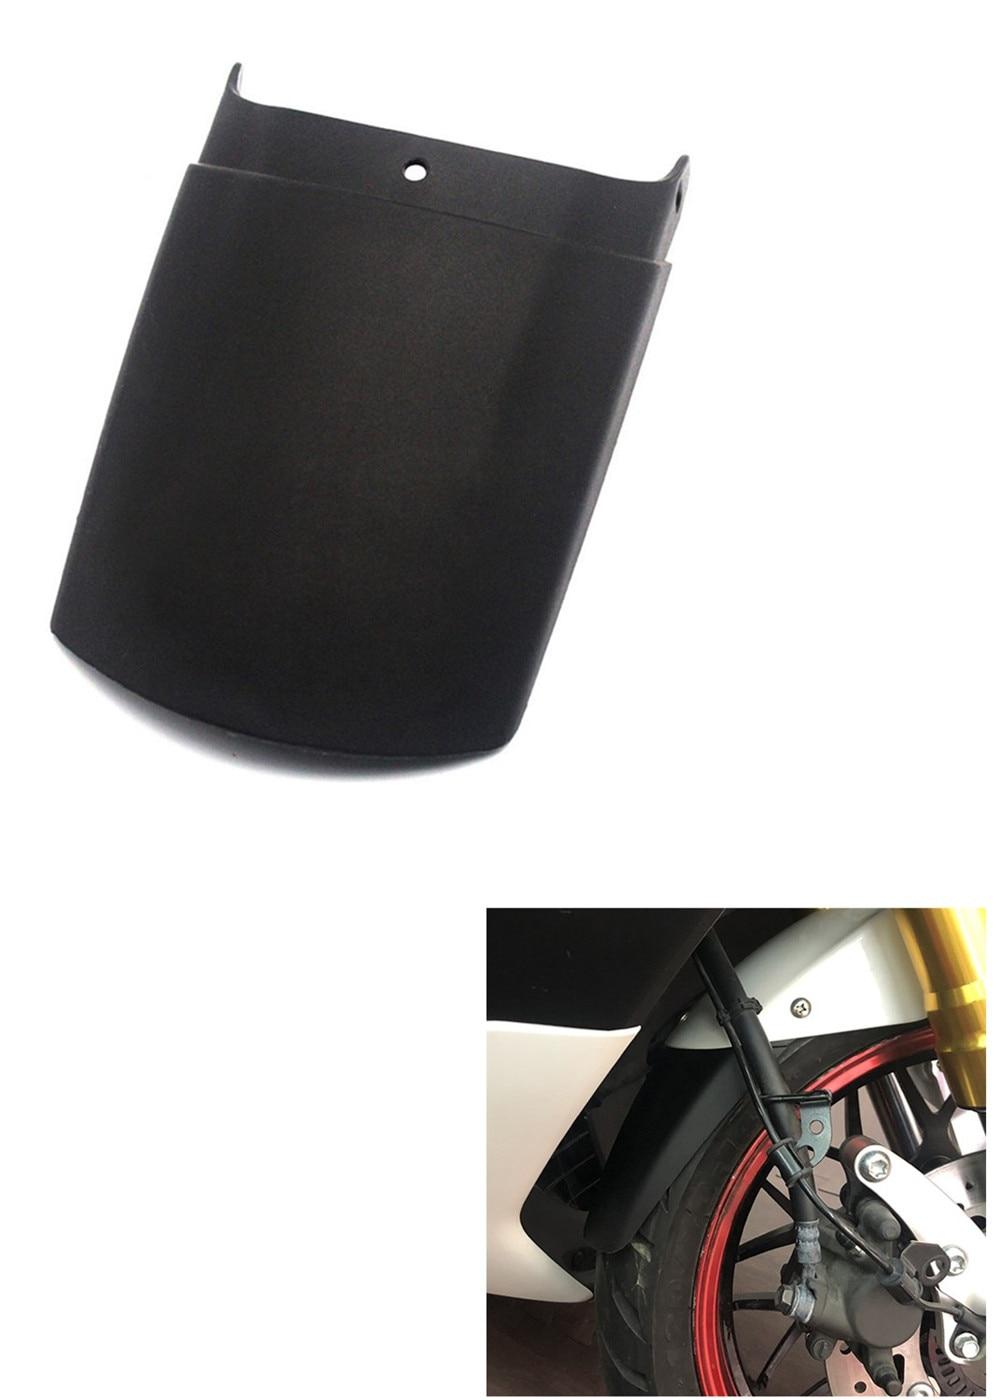 Color : Black Stark Und Robust Motorrad Front Extension Splash Schlammklappe F/ür Yamaha NMAX 155